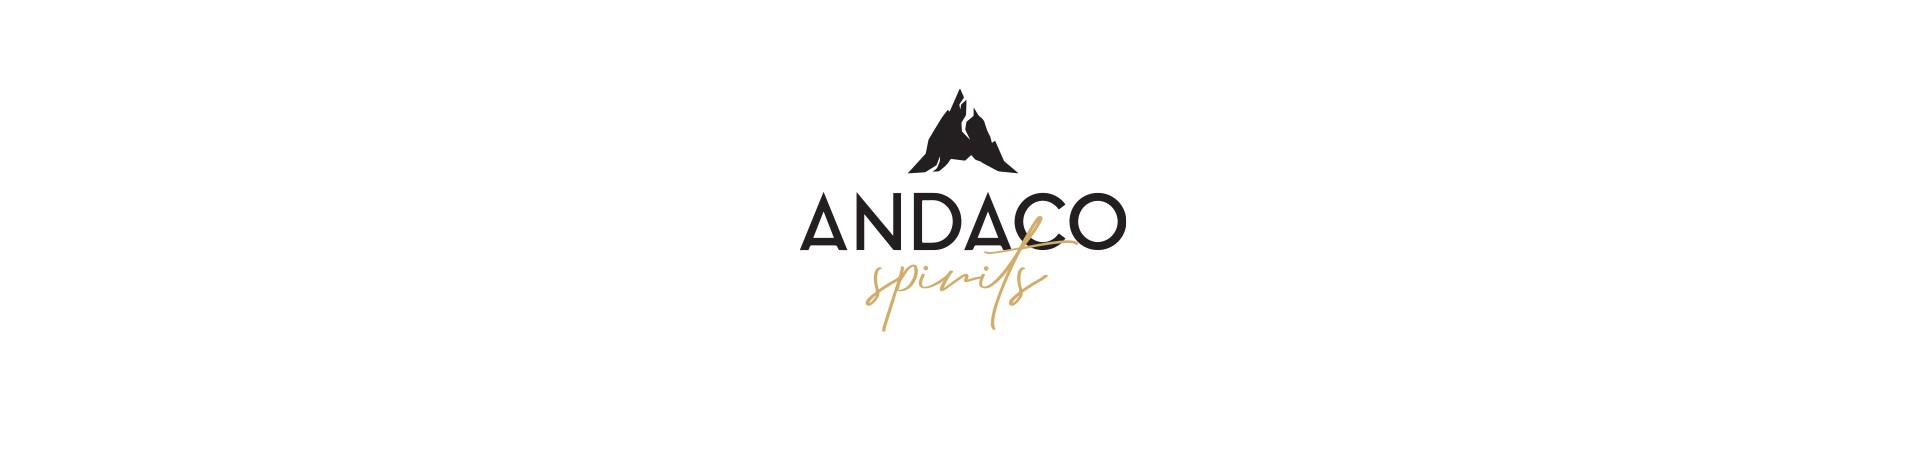 Andaco Spirits